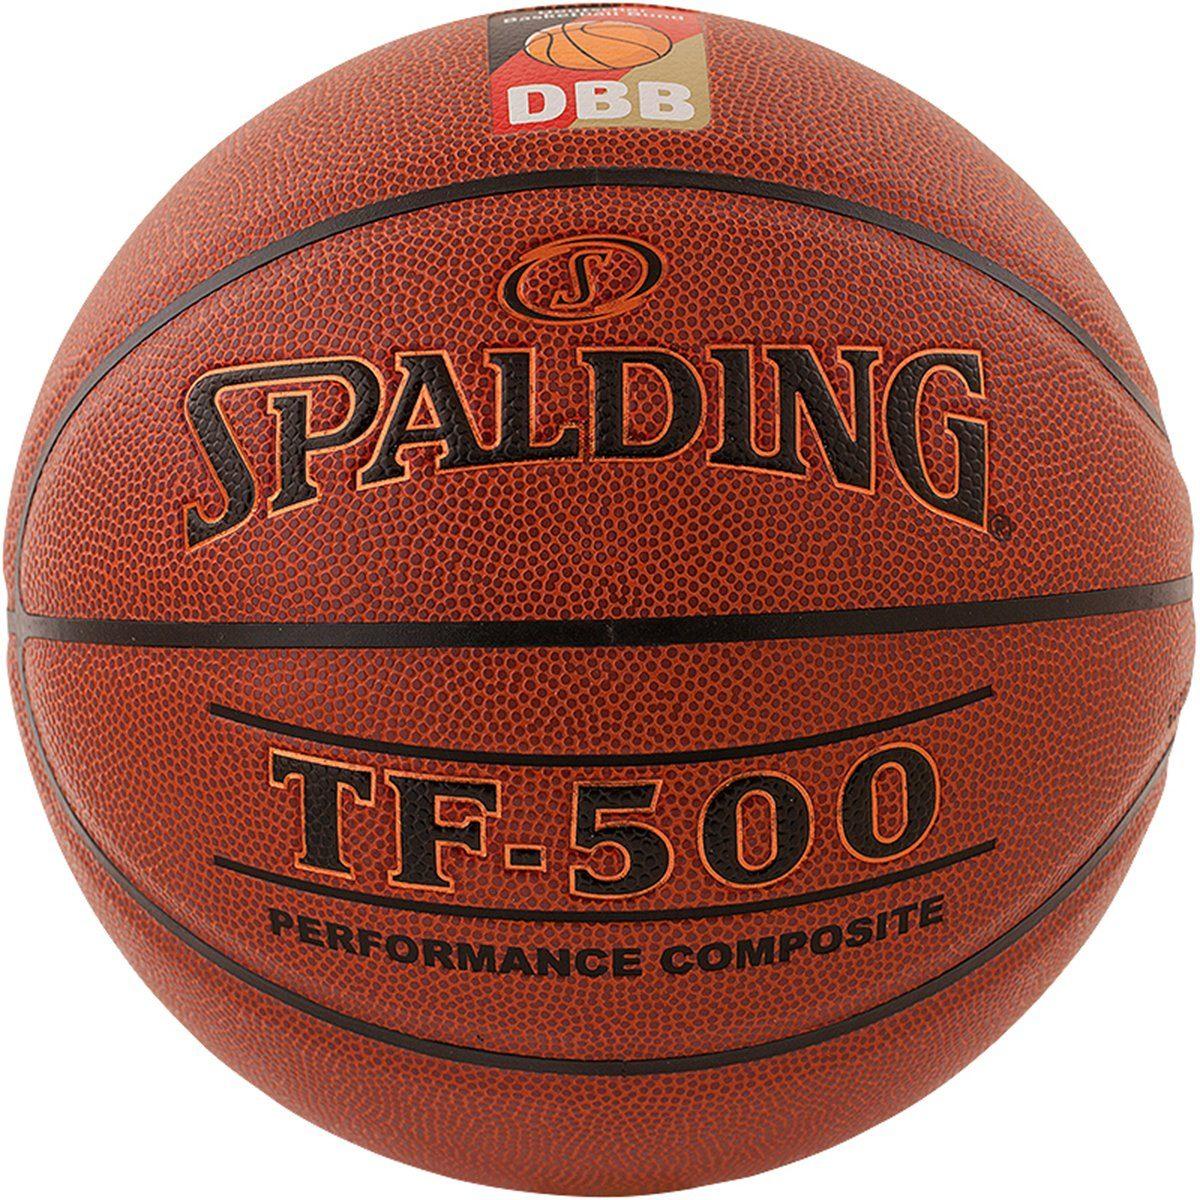 SPALDING TF500 DBB Indoor Basketball